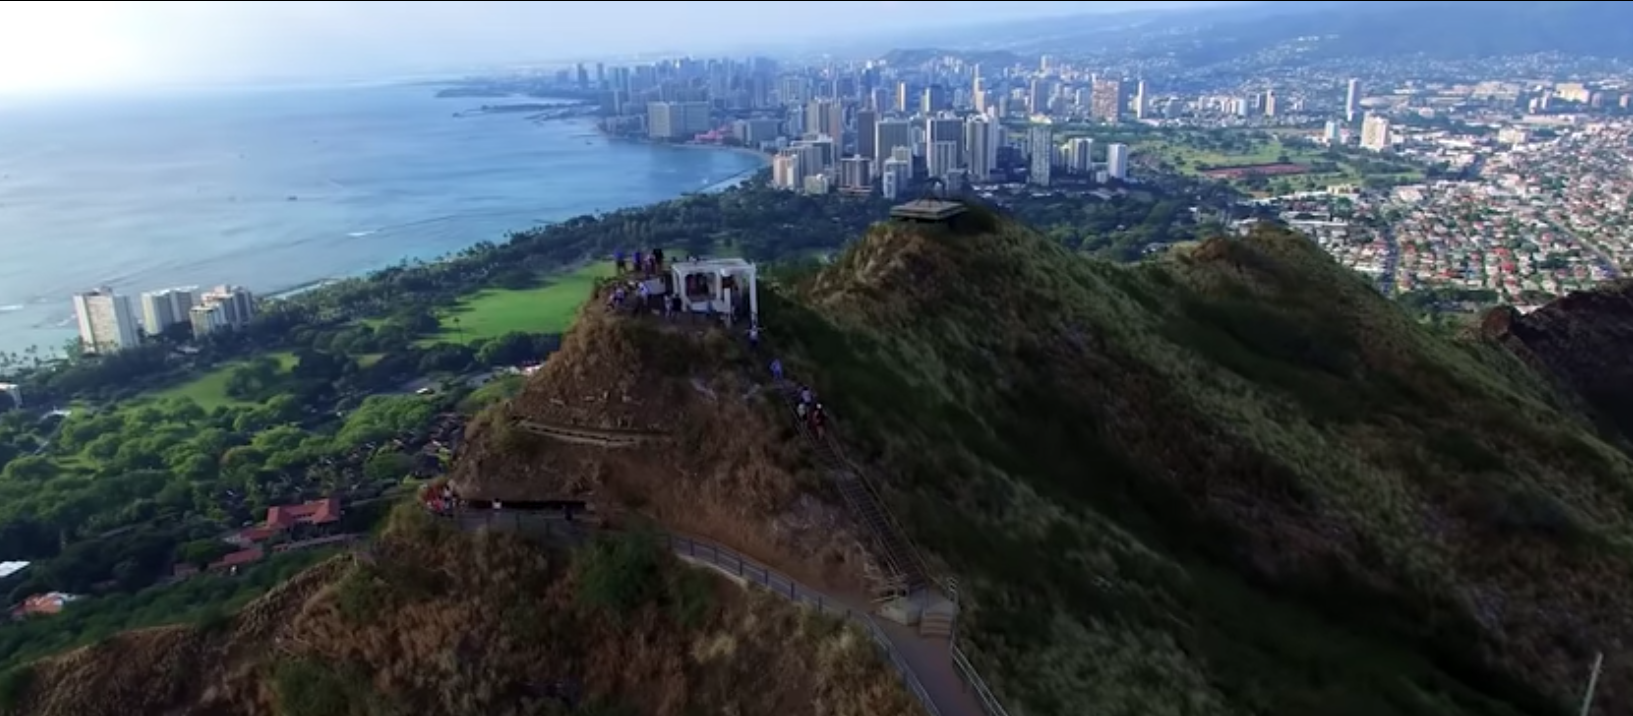 Waikiki from above Diamond Head. Credit: UH News